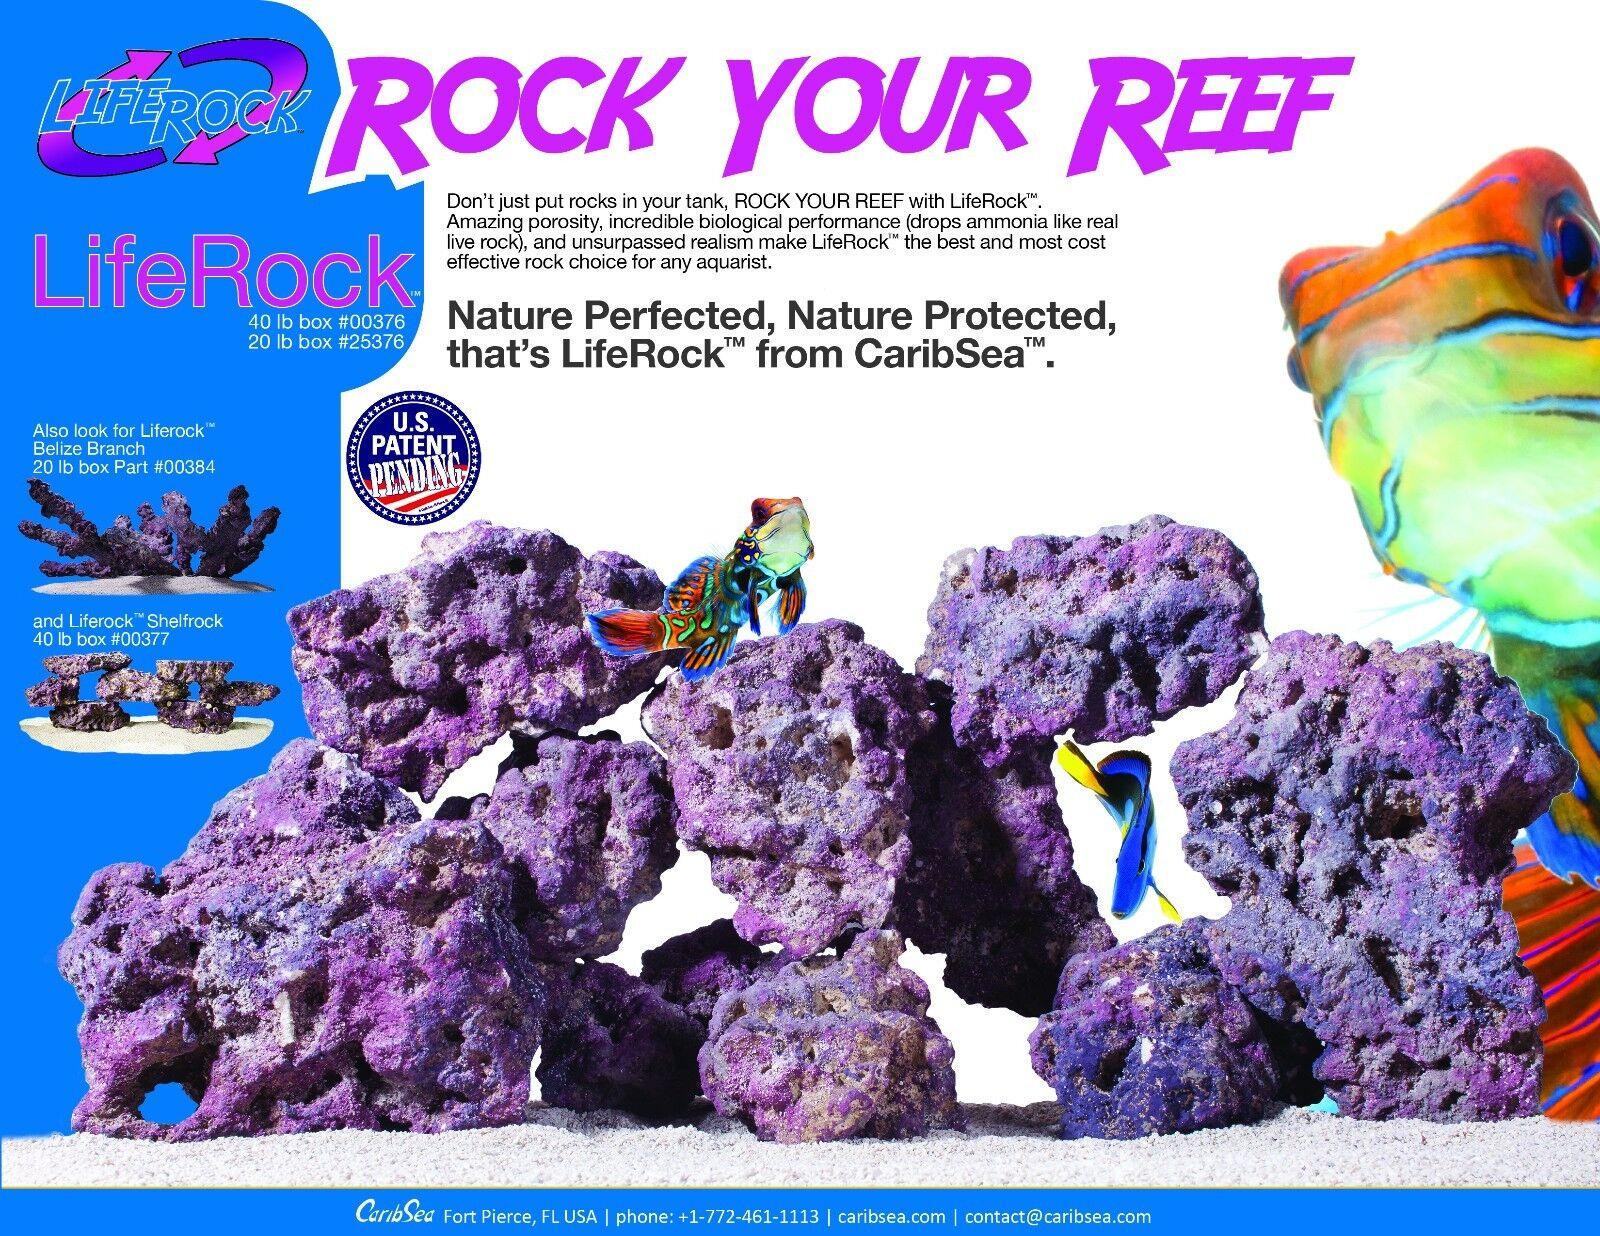 Caribsea Life Rock 9kg 20 LBS Box Real Reef Aquarium lila Live Rock Fish Tank